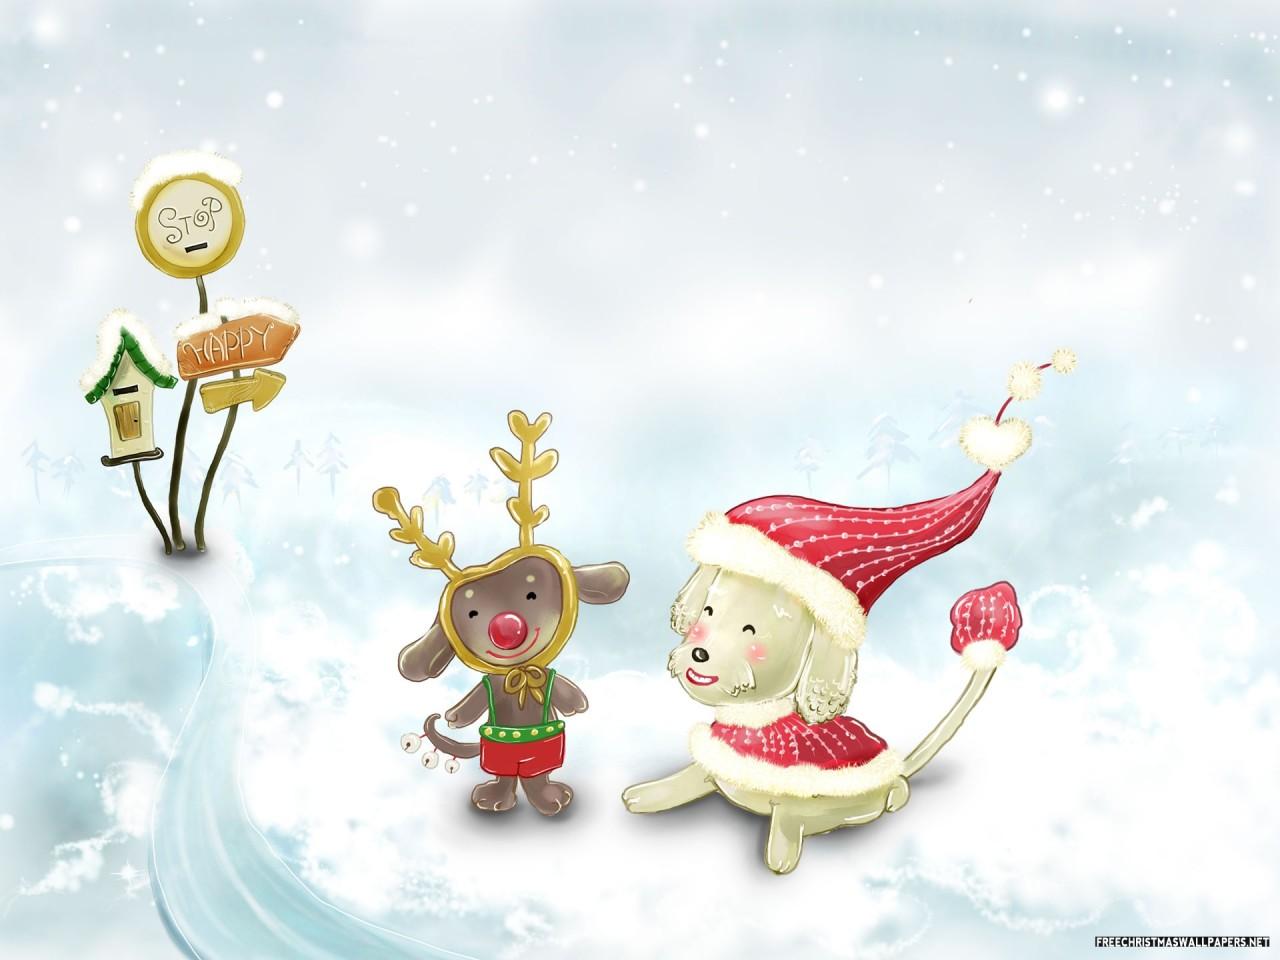 Merry Christmas Greetings 1280x960 Wallpaper